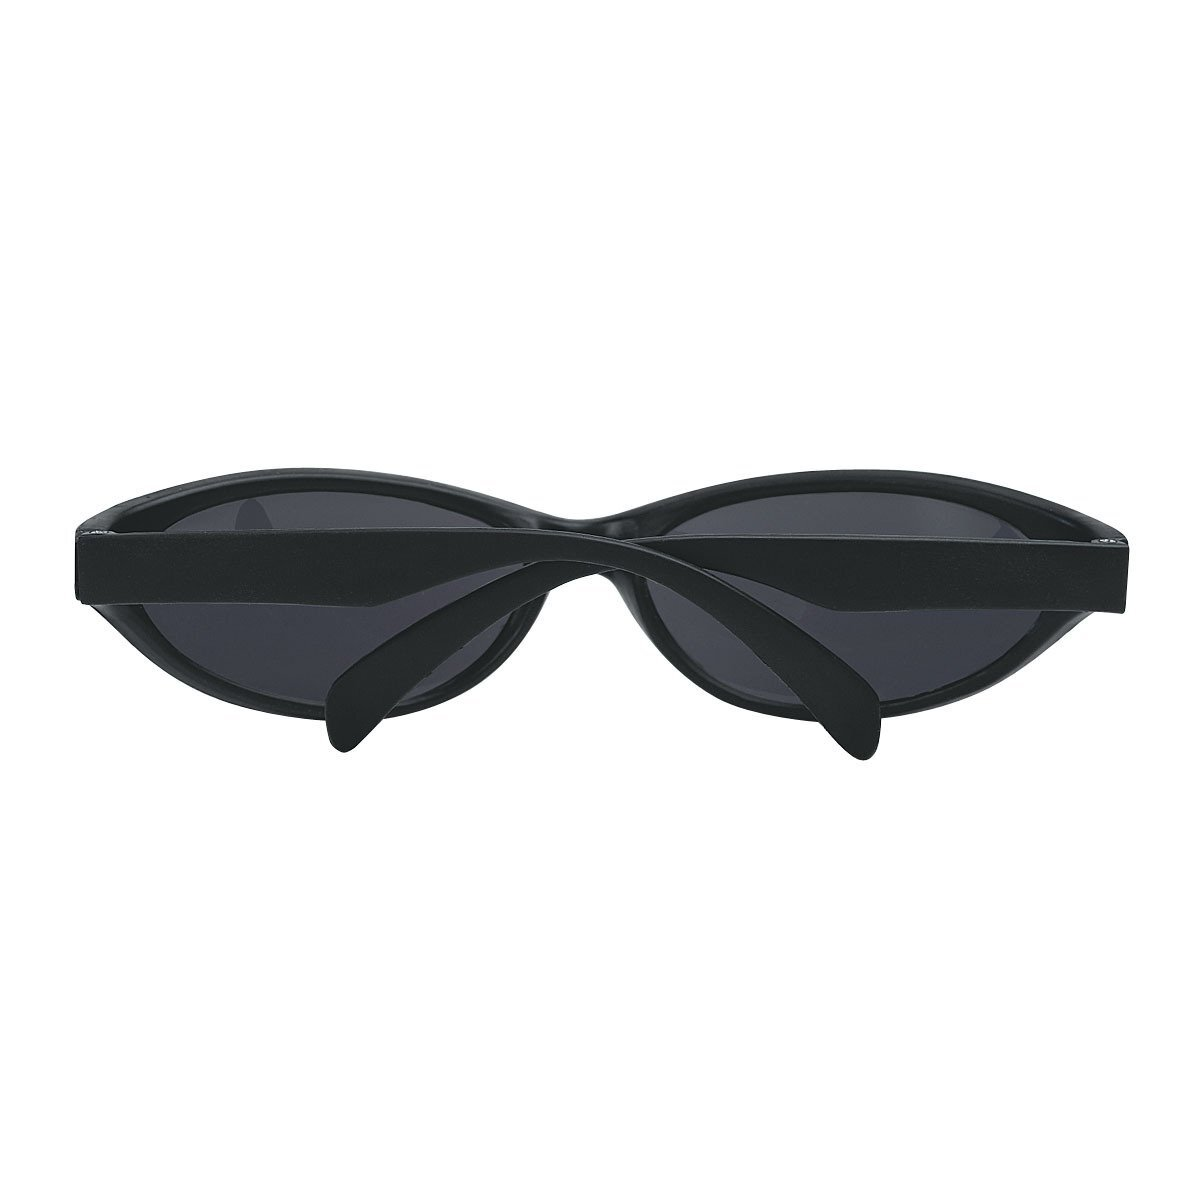 Wave Rubberized Sunglasses